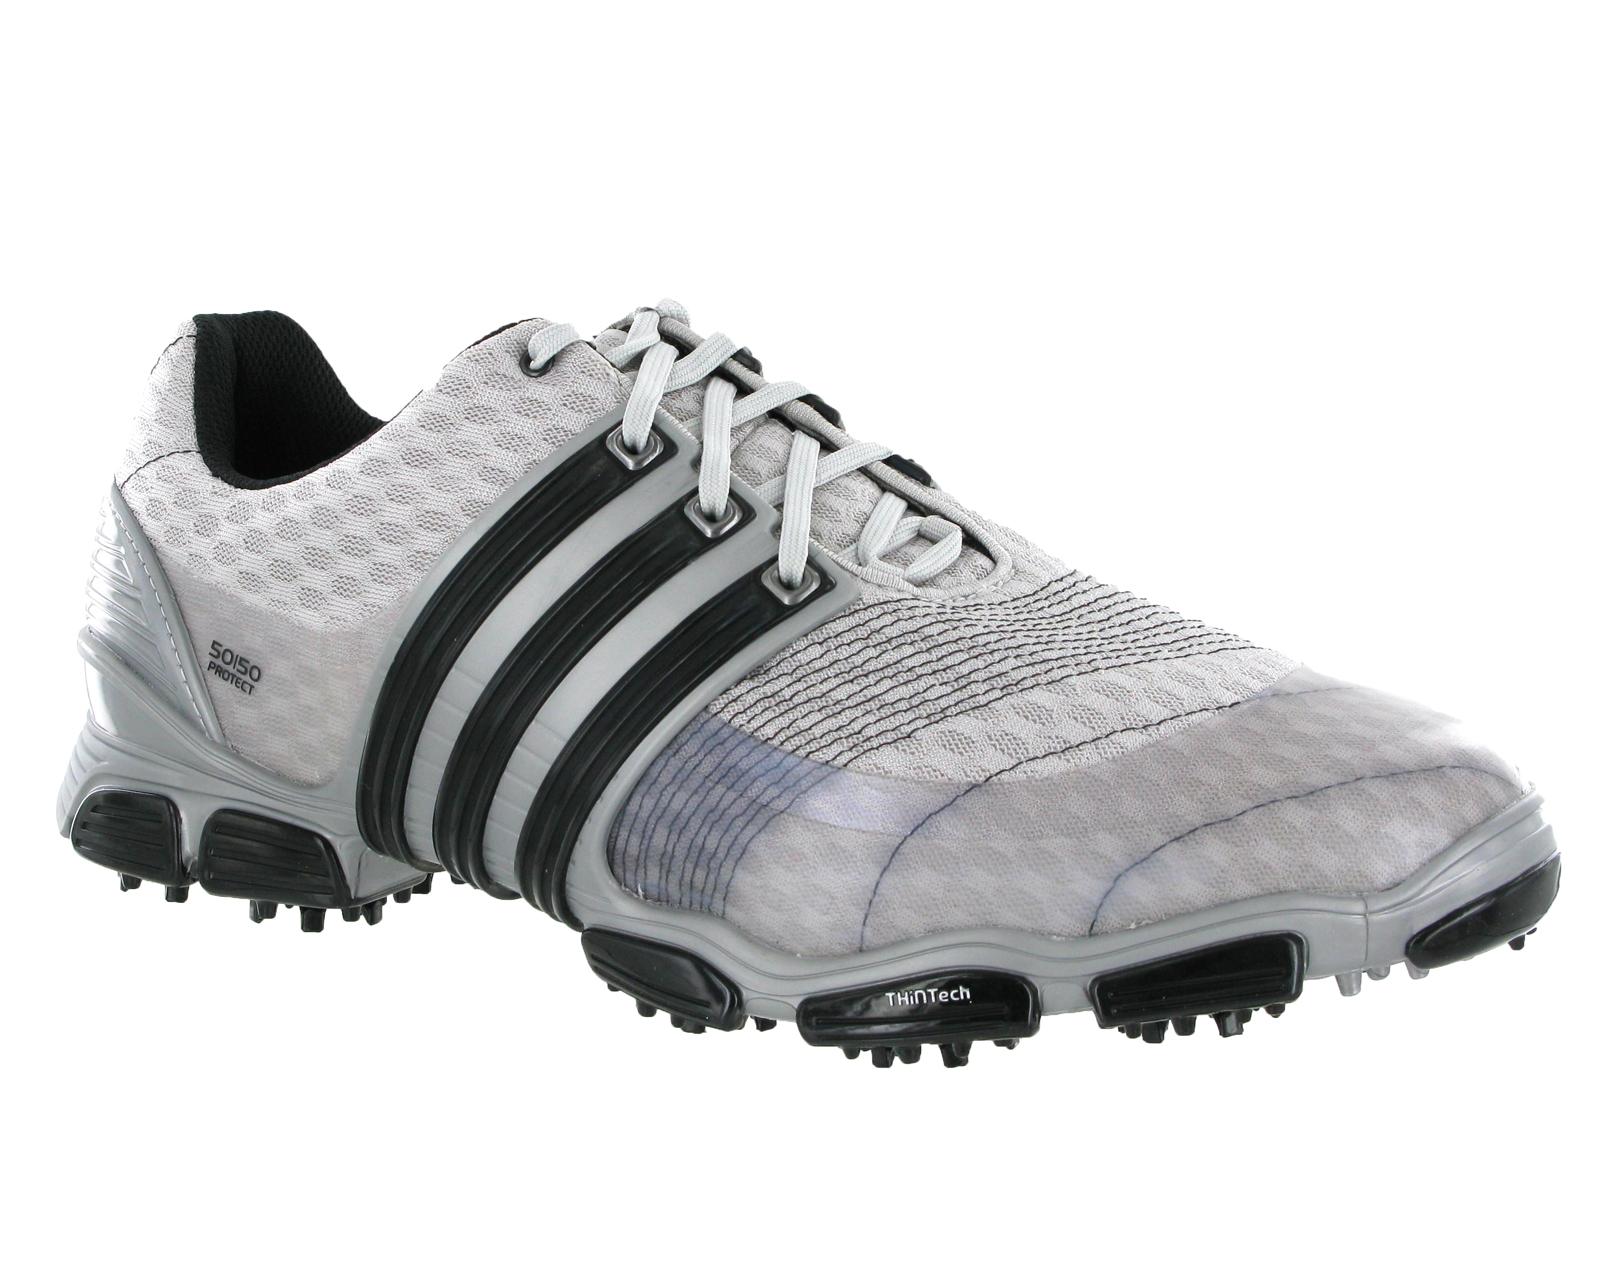 new arrival 99695 392c2 chaussure adidas samba 1 z